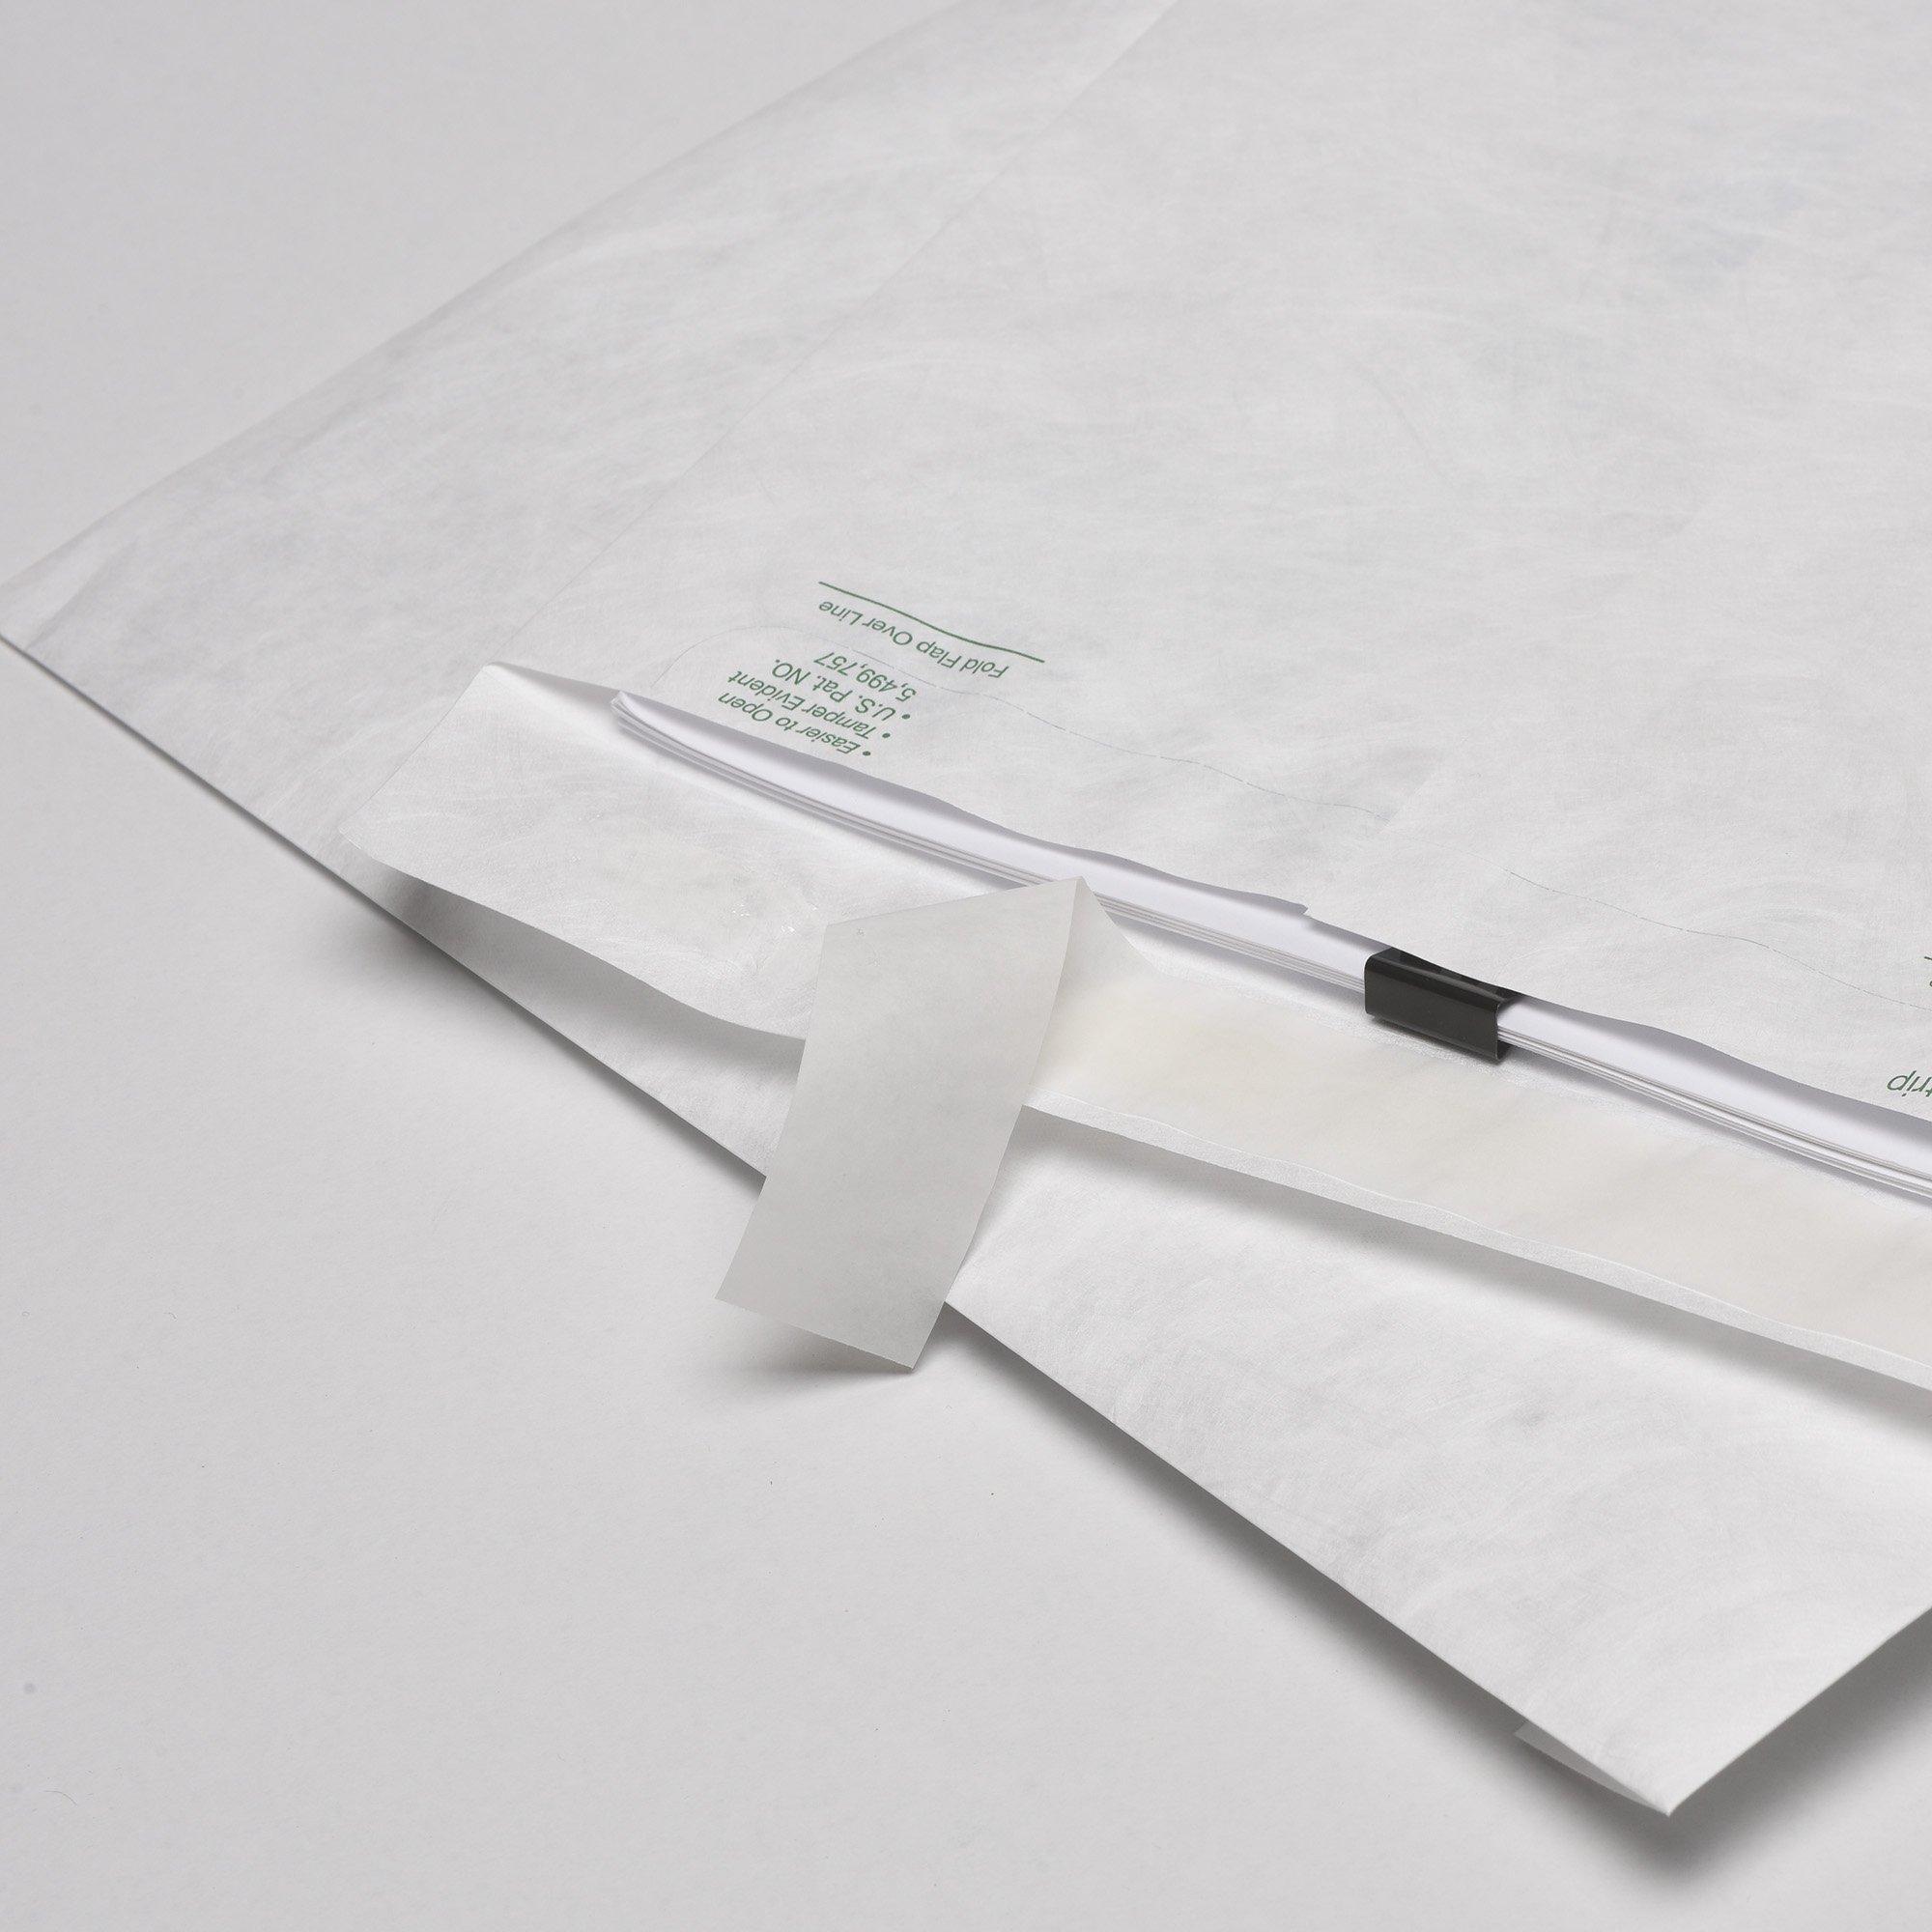 Quality Park Survivor R1460 Tyvek Mailer, 9 x 12, White (Box of 100) by Quality Park (Image #7)